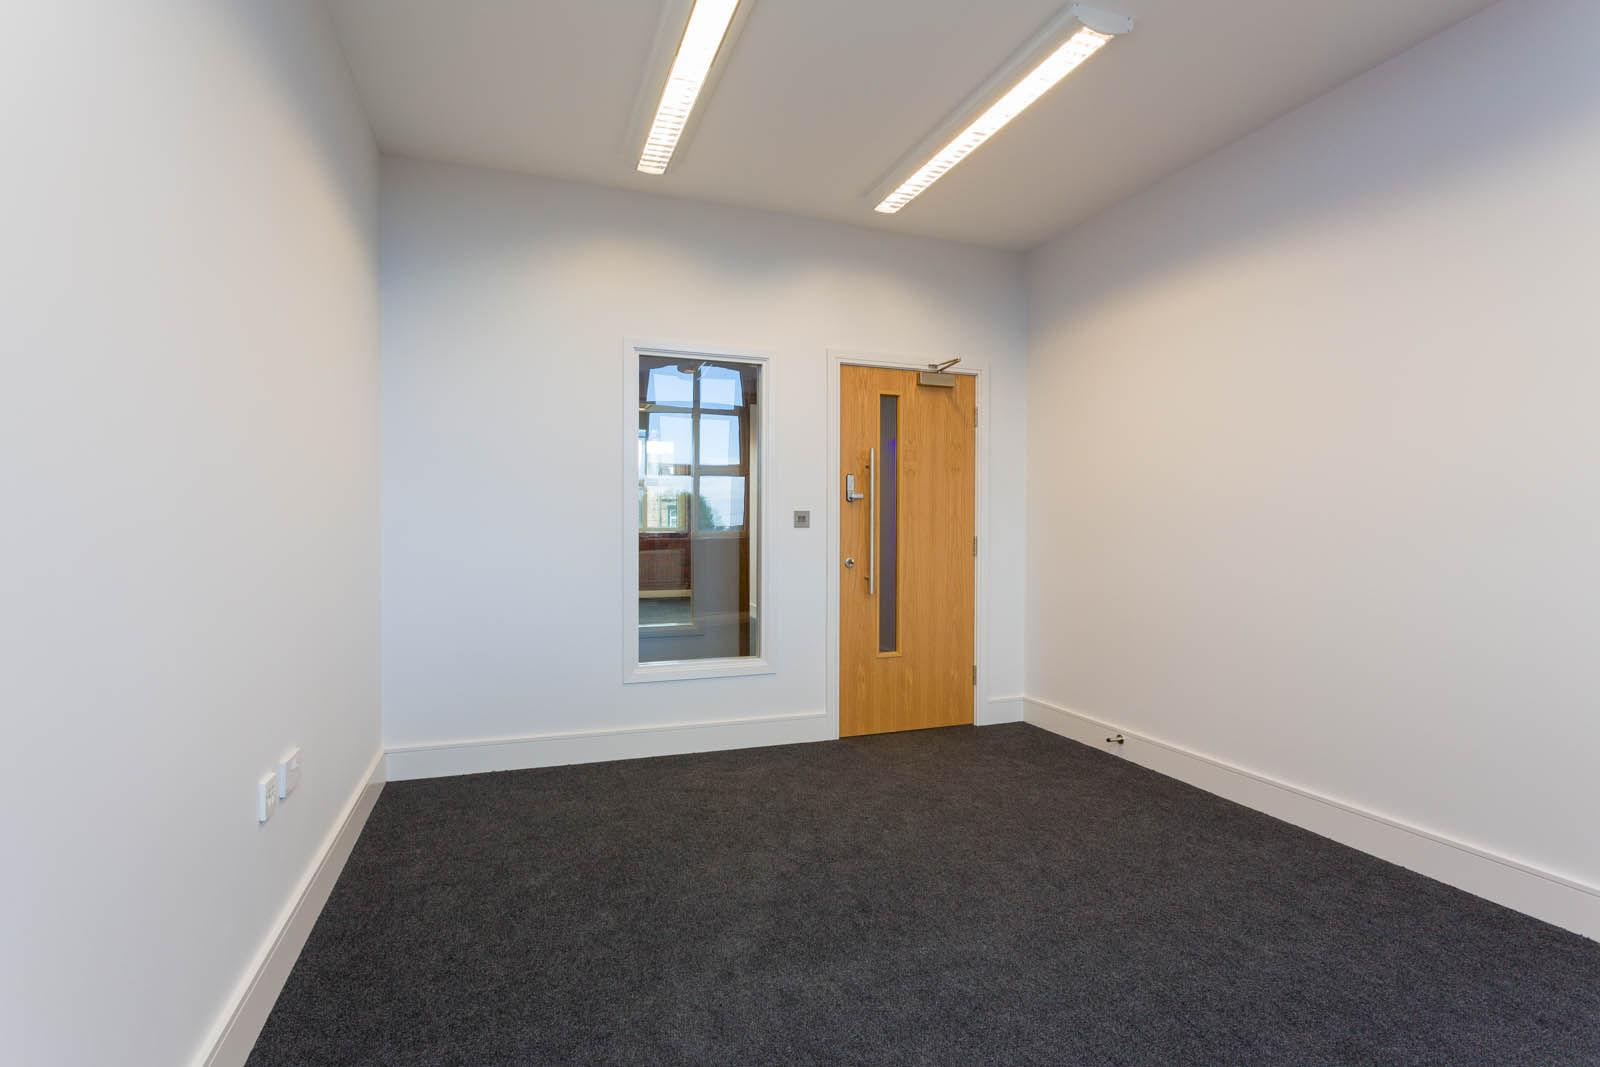 office-interior-window.jpg